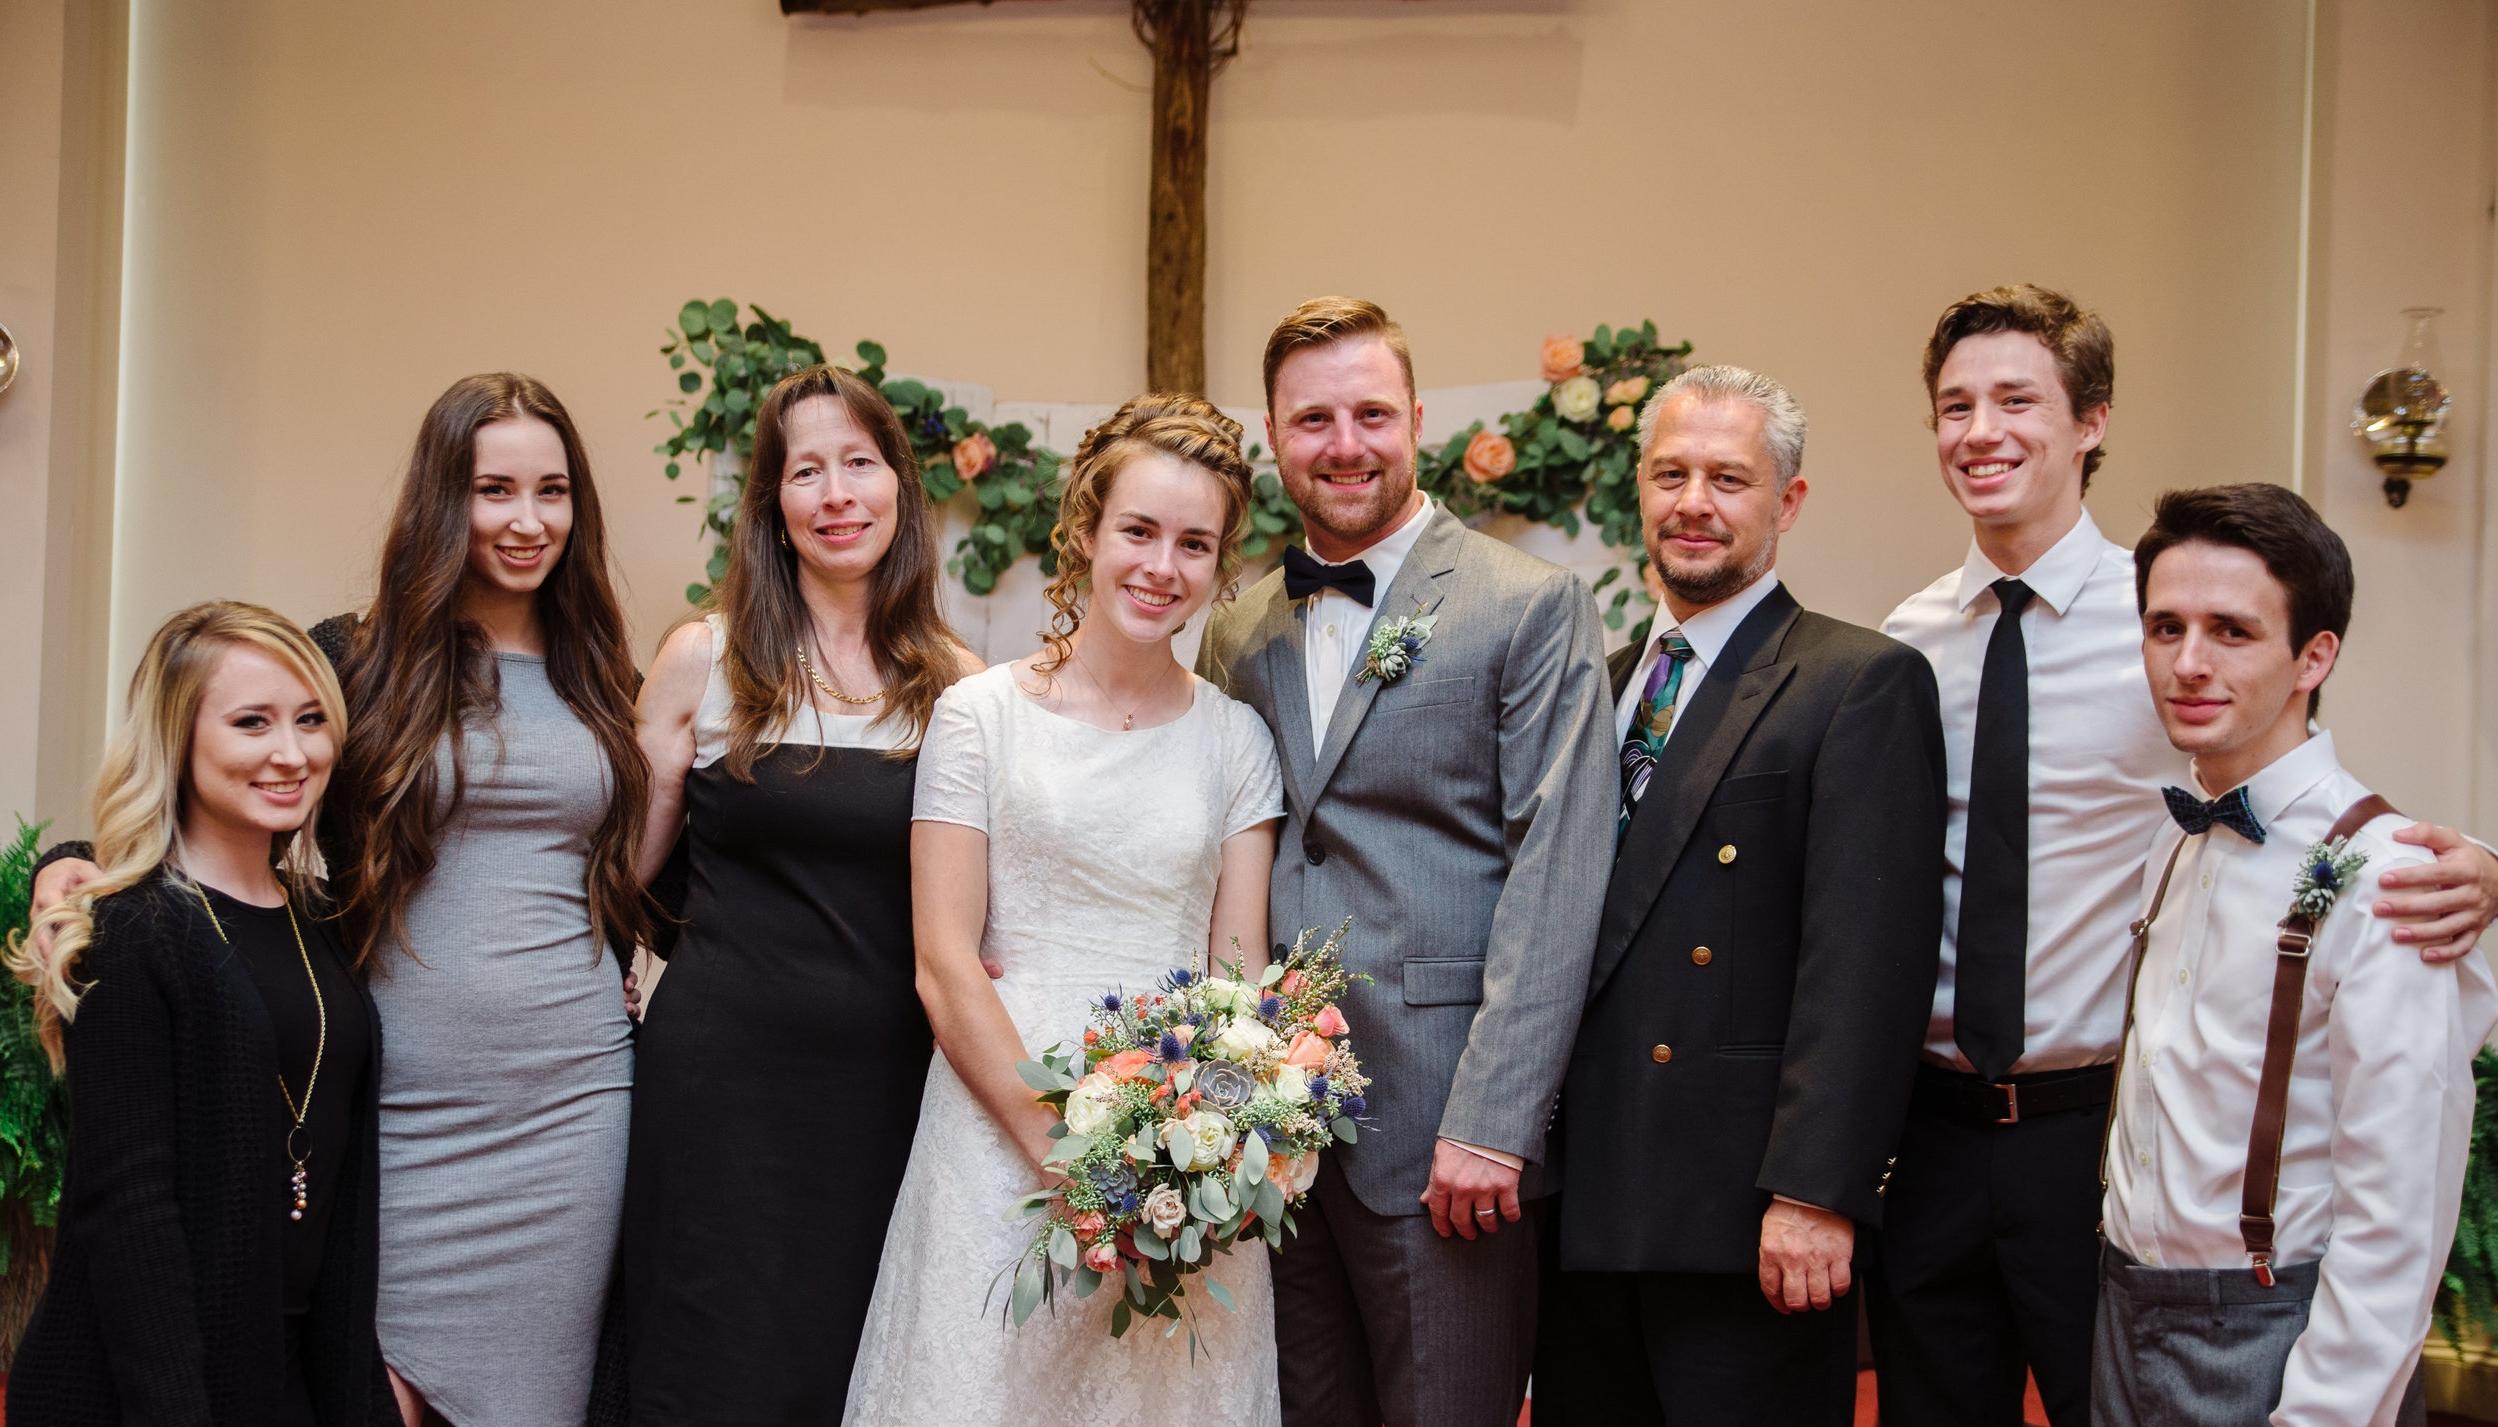 The Diepeveen Family